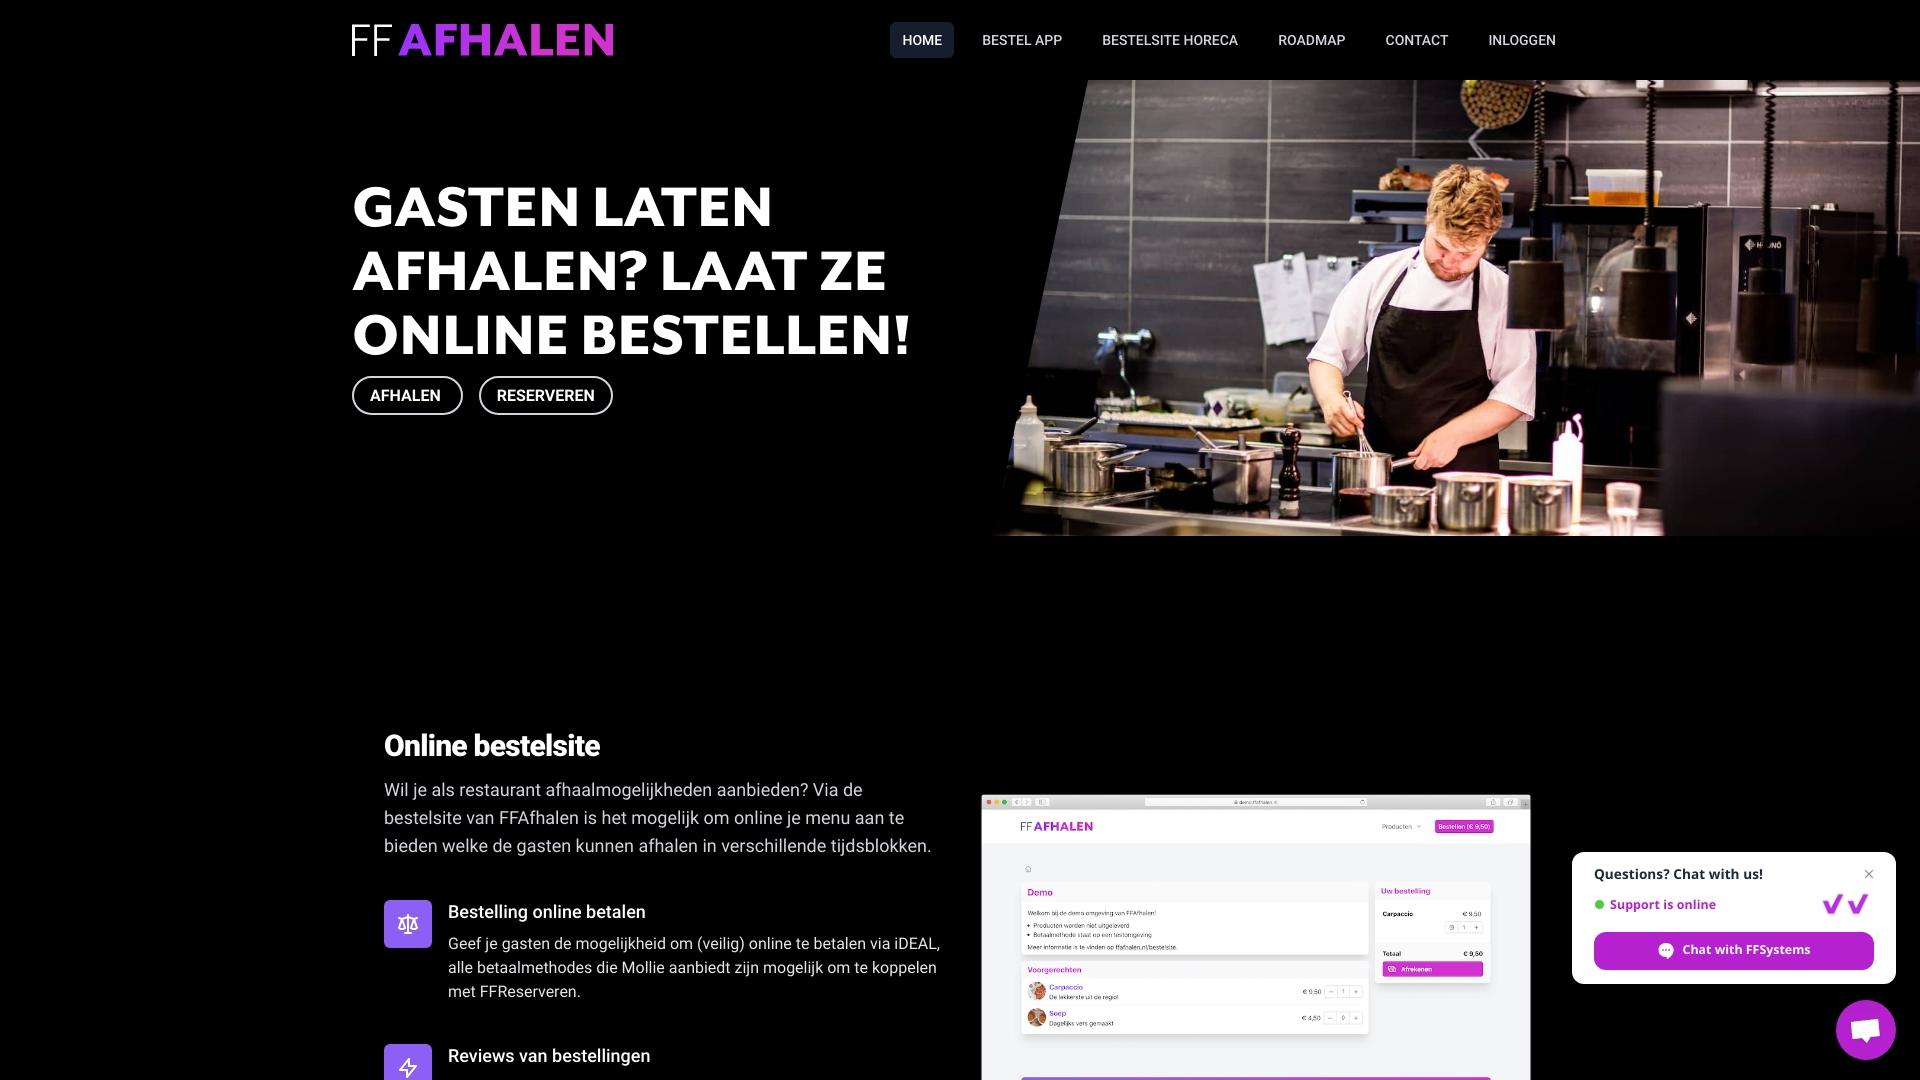 FFAfhalen.nl